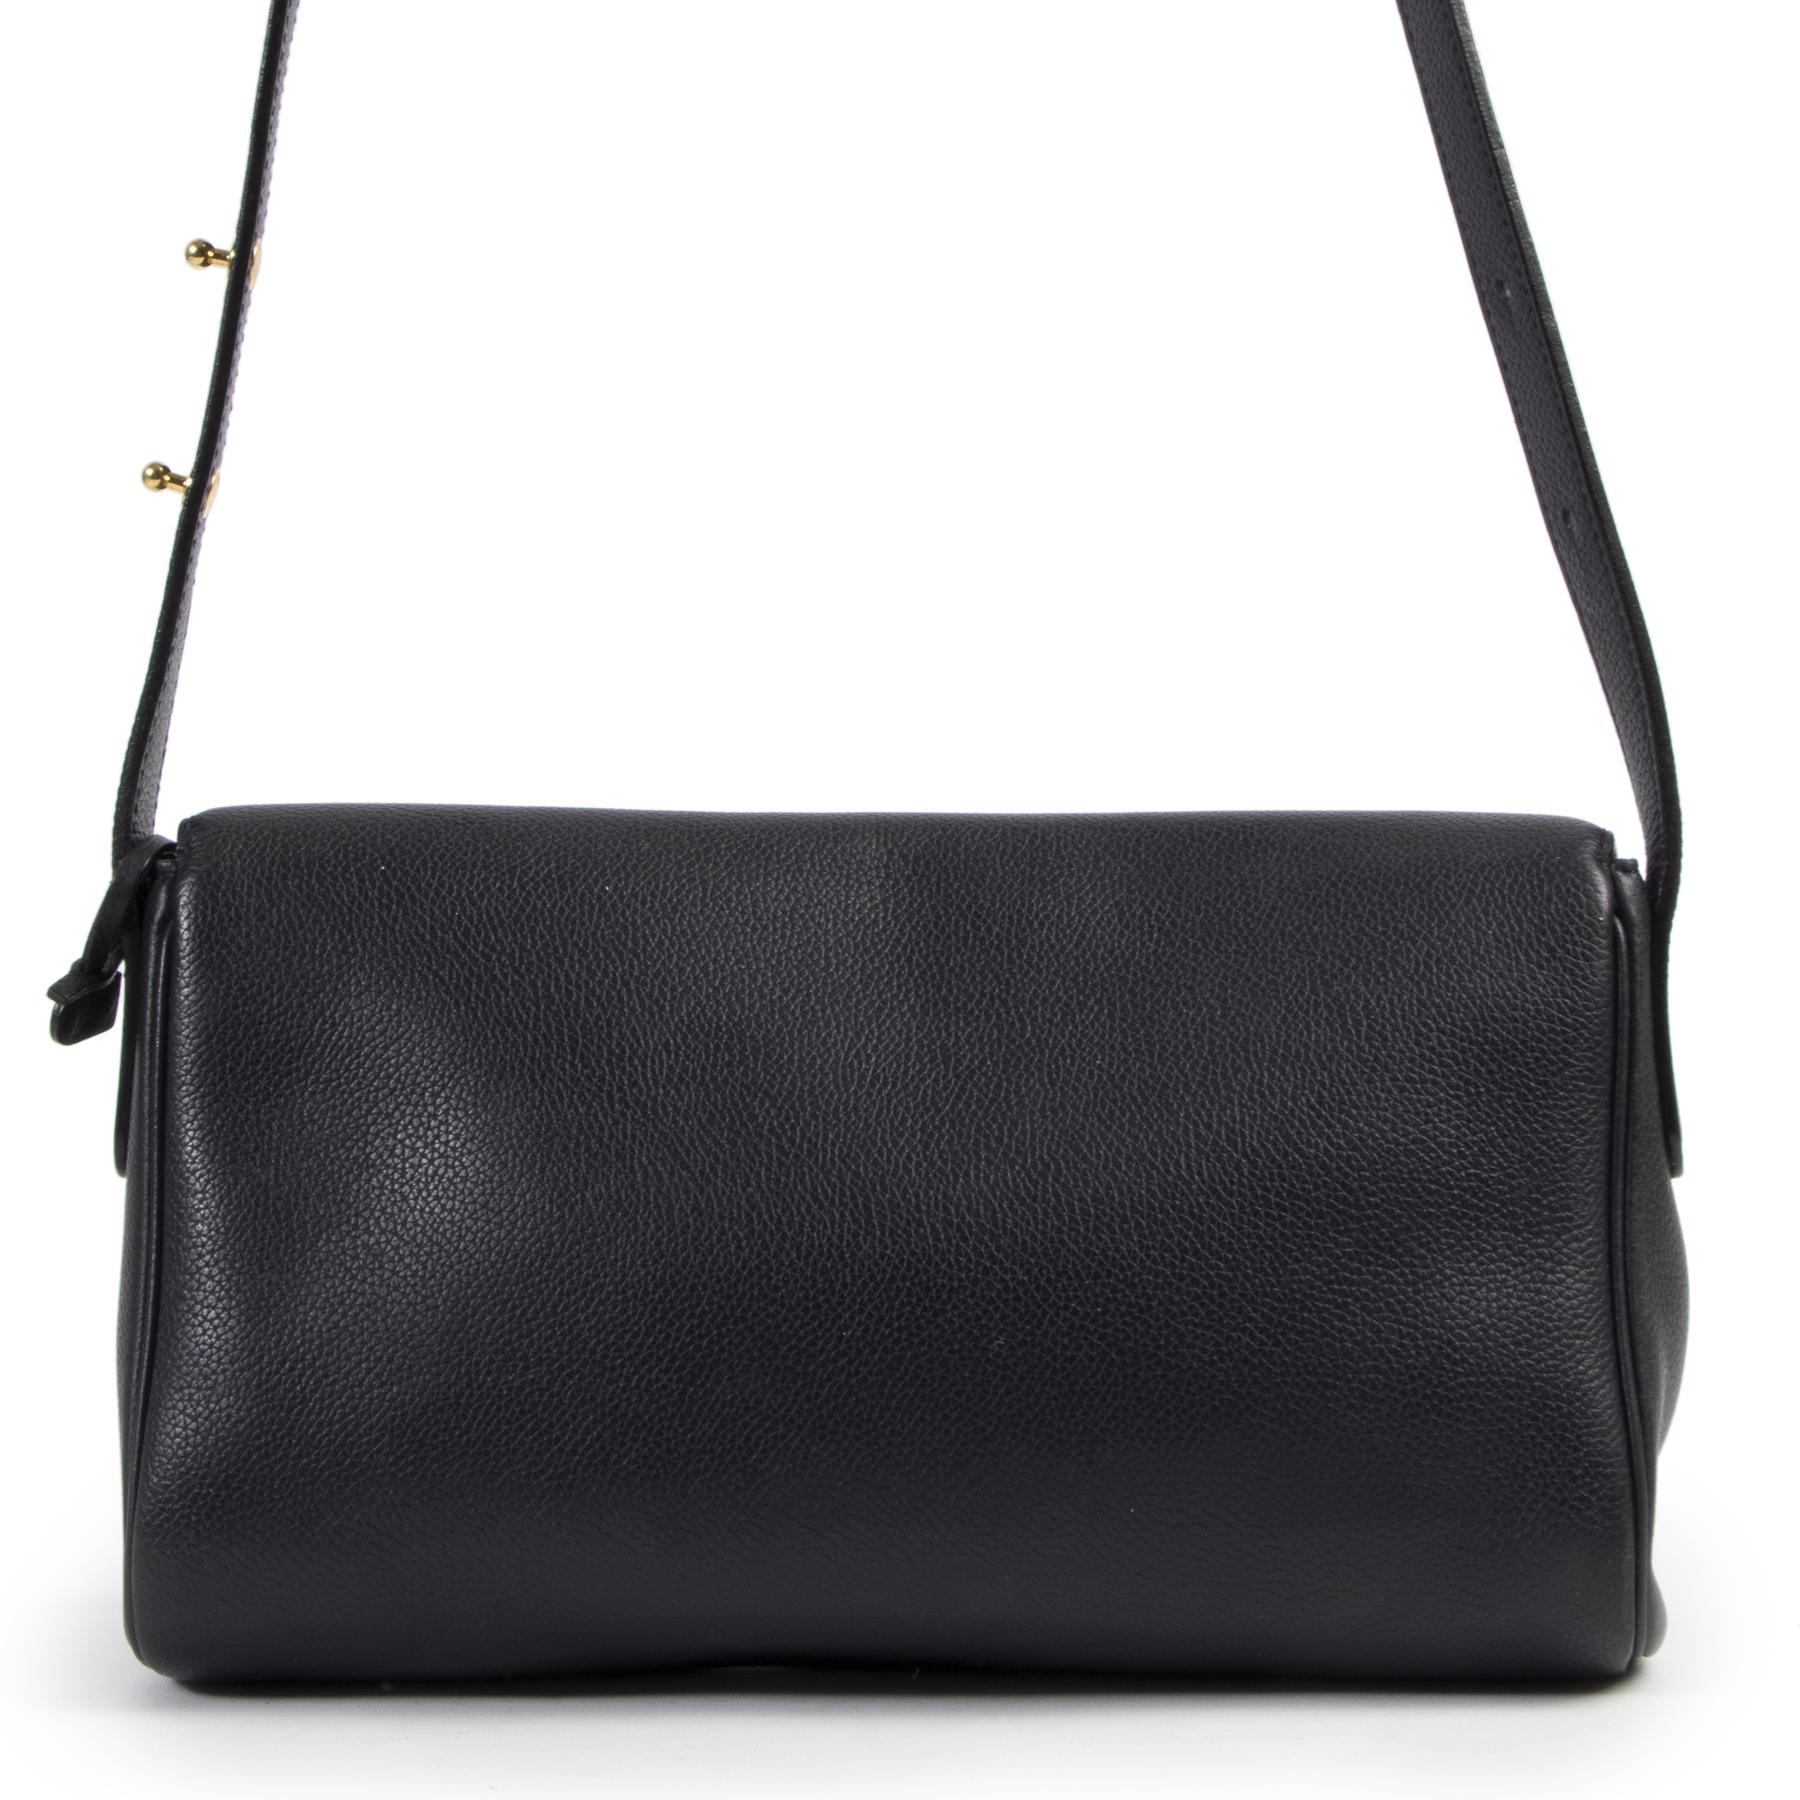 Authentic secondhand Delvaux Blue Passerelle Crossbody Bag designer bags fashion luxury vintage webshop safe secure online shopping